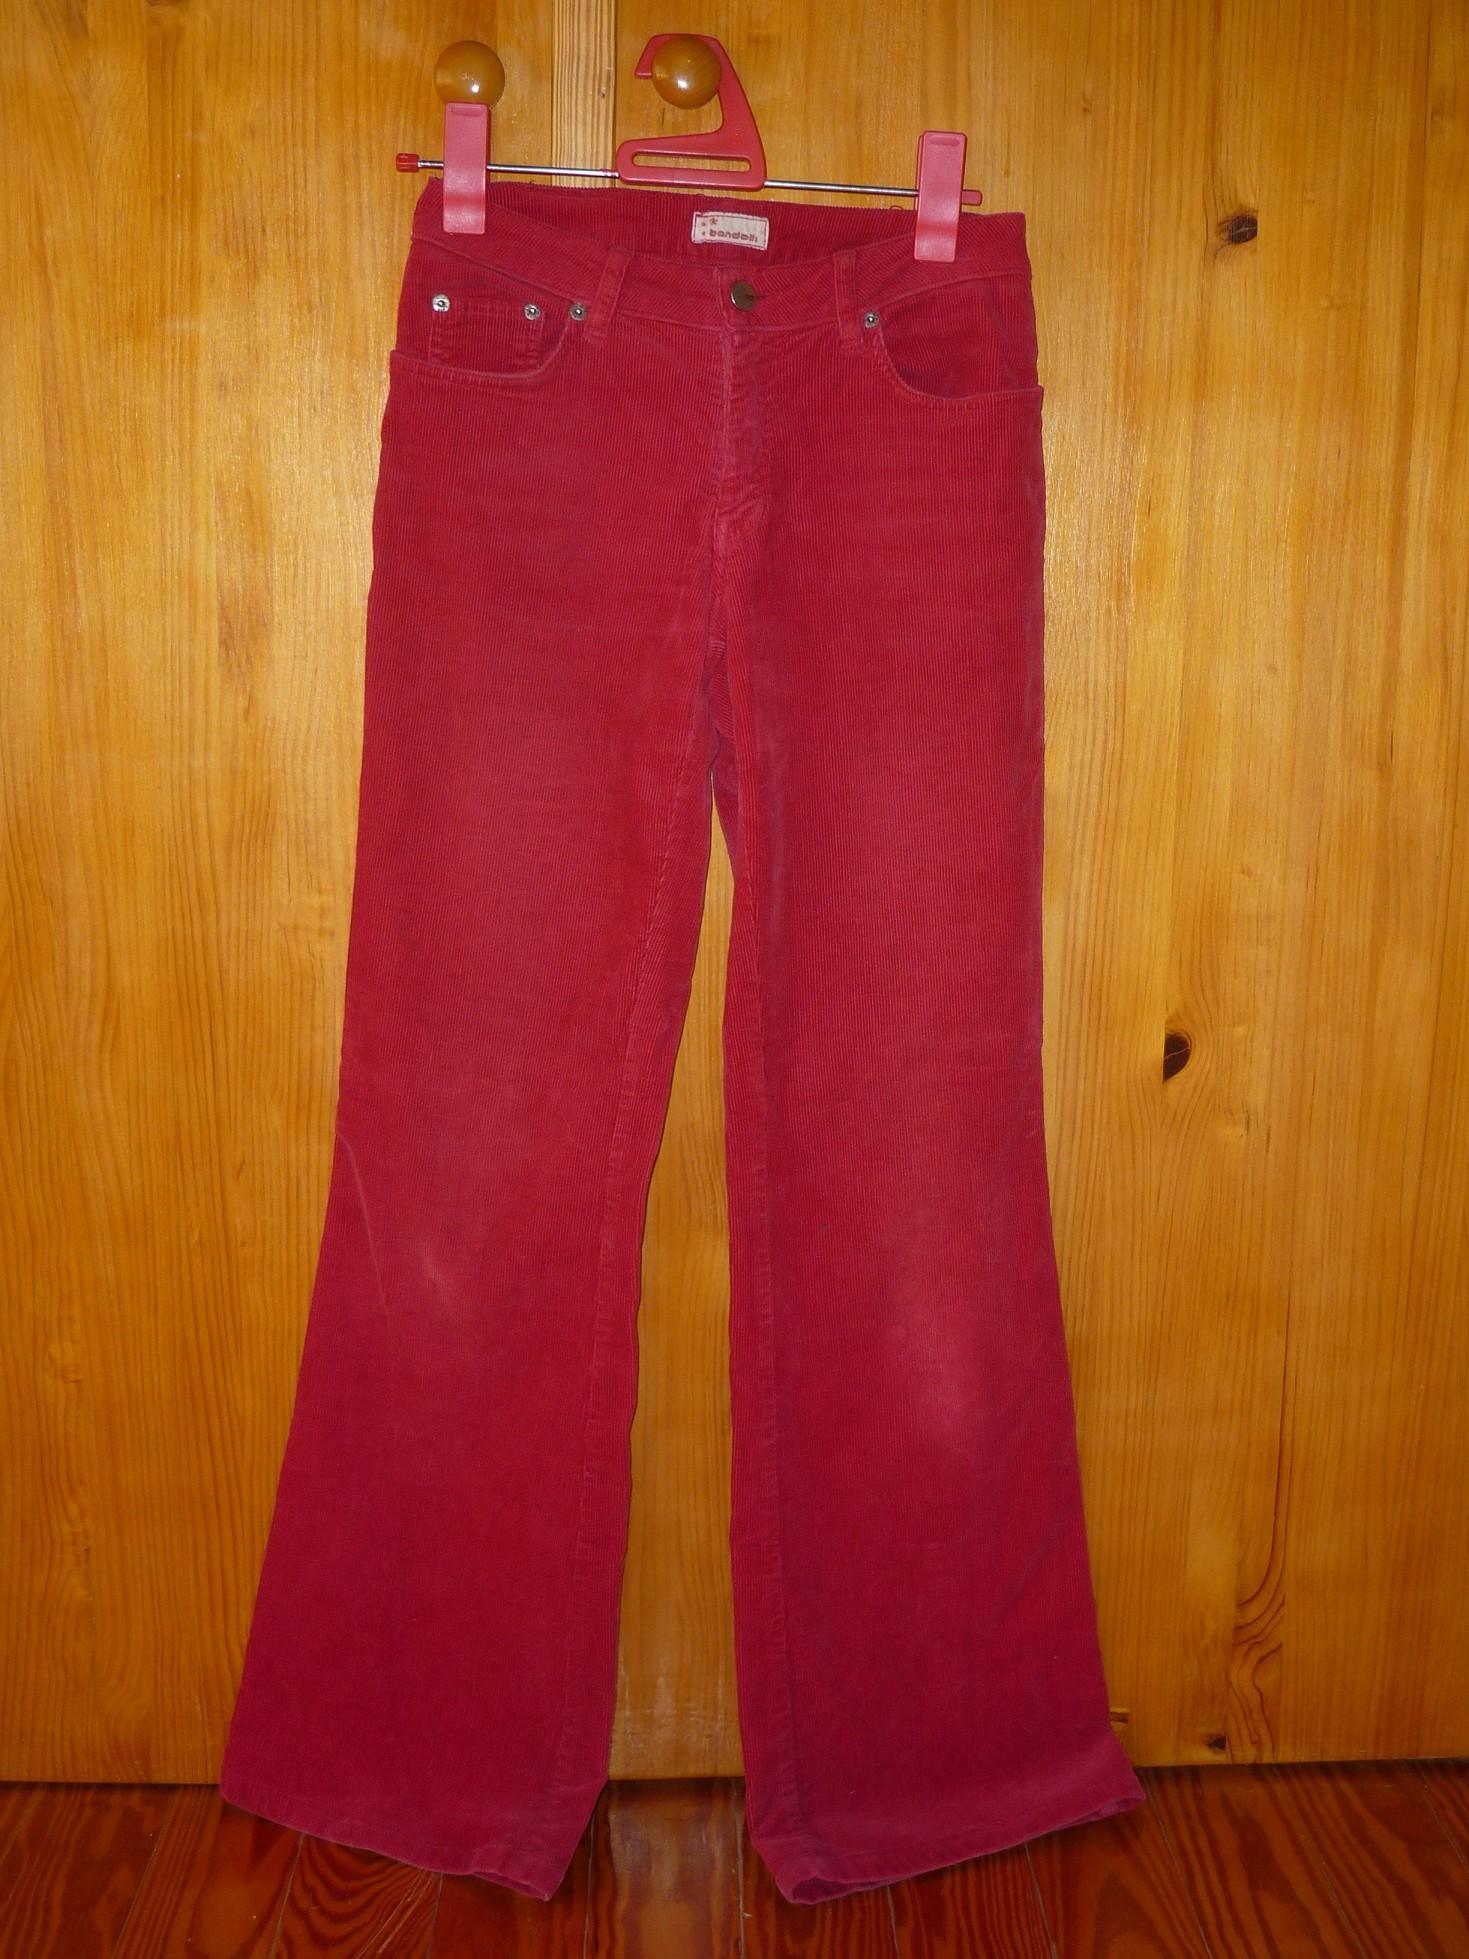 Pantalón pana rojo. Talla 38/36